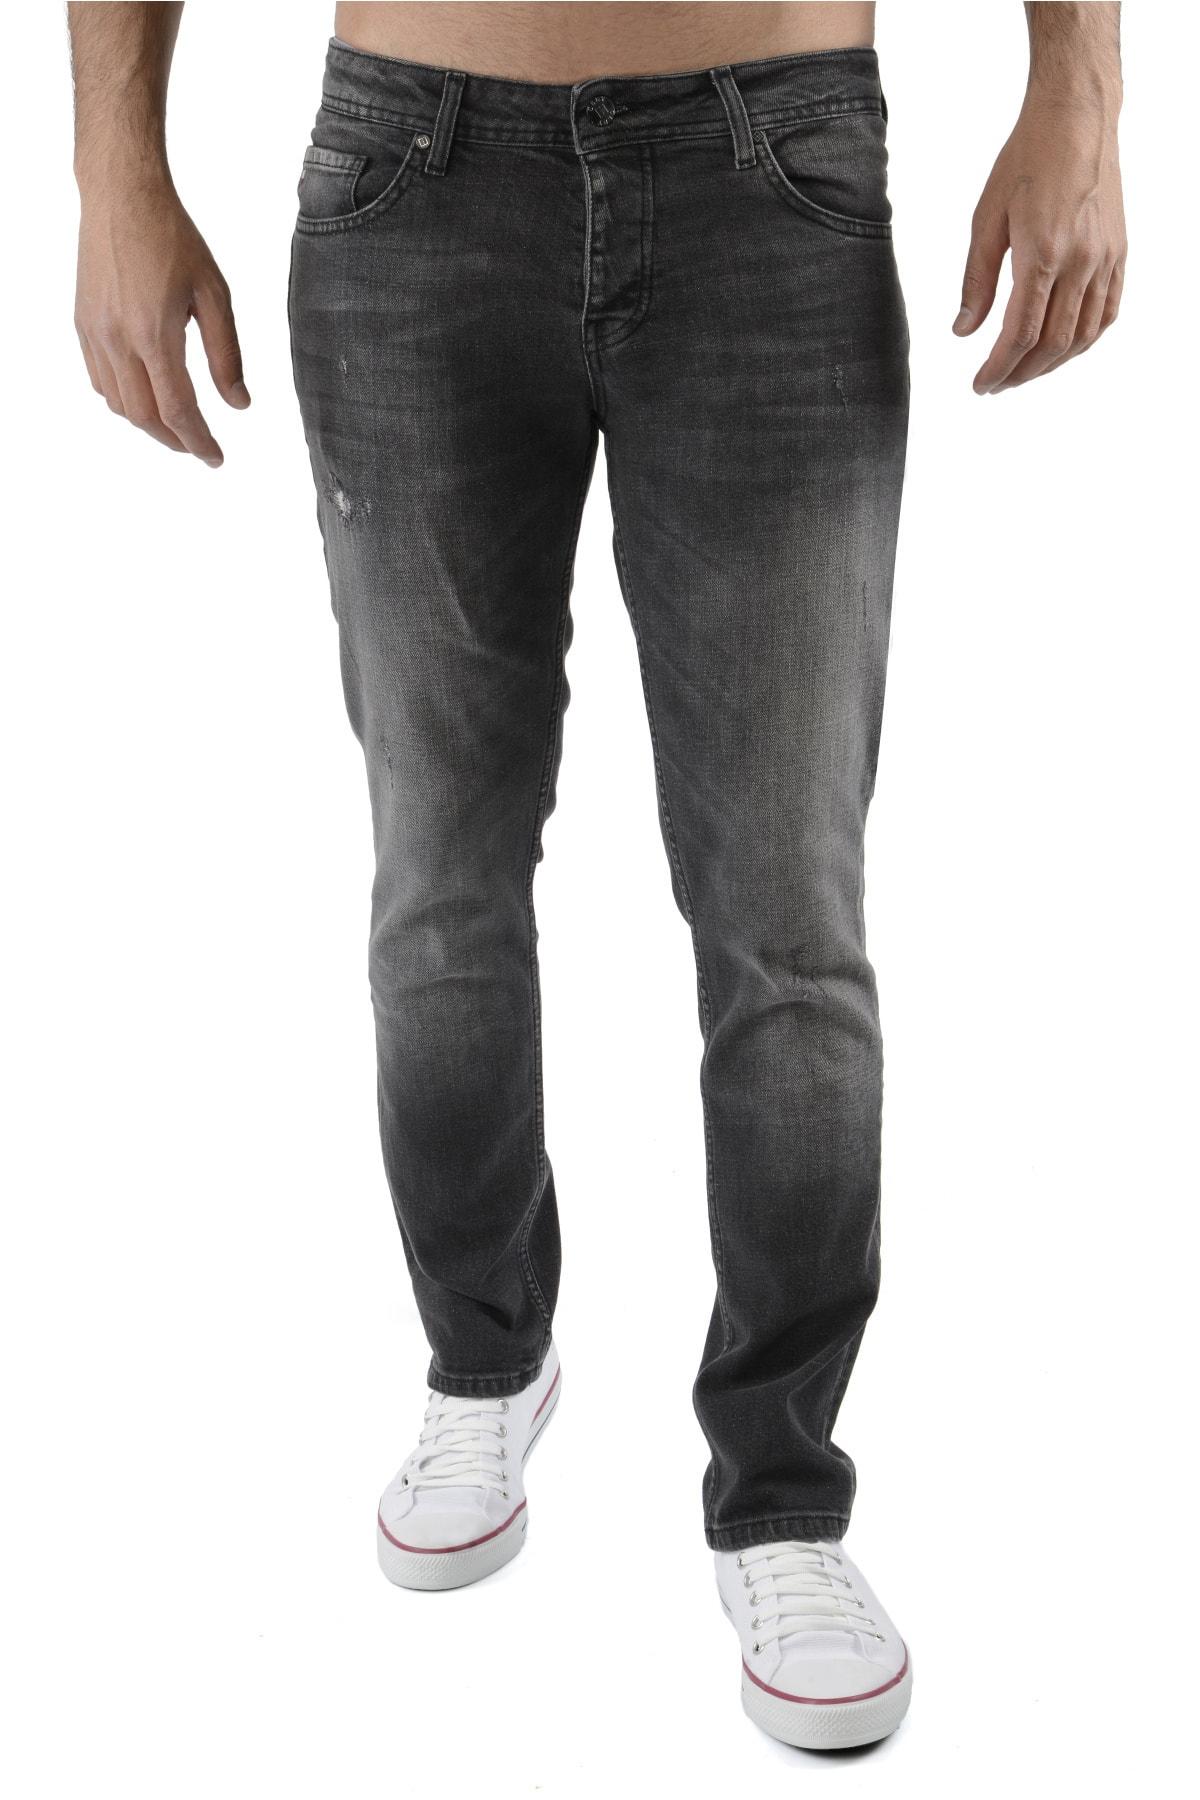 Erkek Antrasit Kot Pantolon Slim Fit Jean - C326